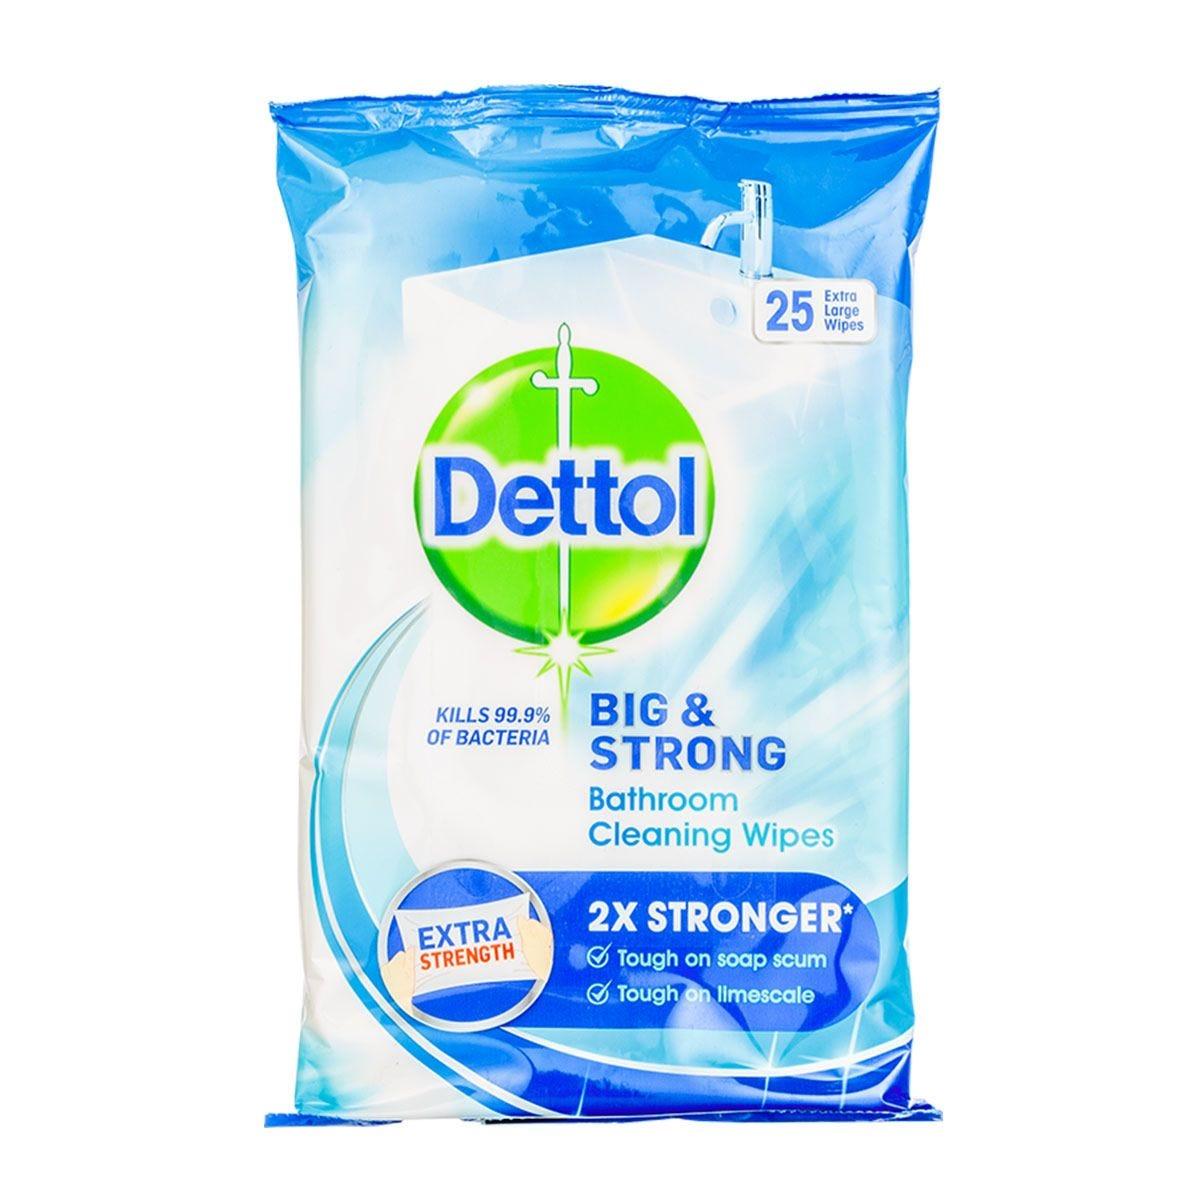 Dettol Big & Strong Antibacterial Bathroom Wipes - 25 Pack